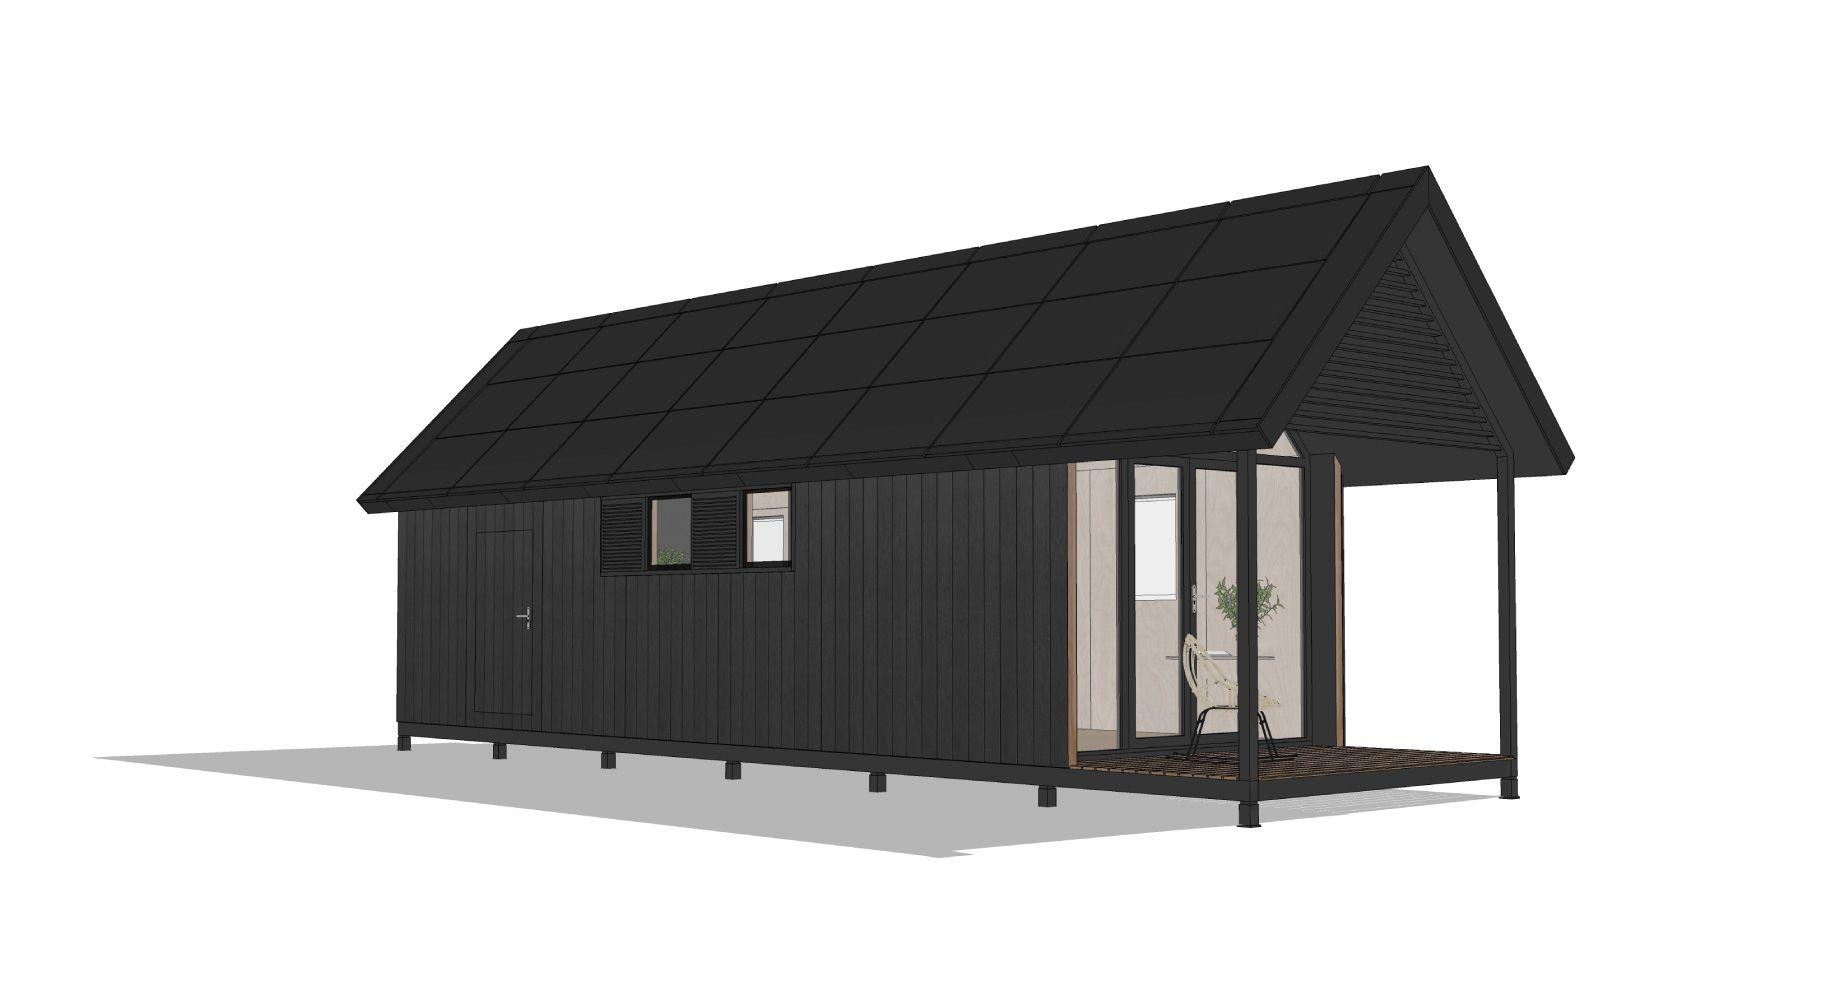 Tiny house millhome haus garten pinterest house for Tiny house movement nederland